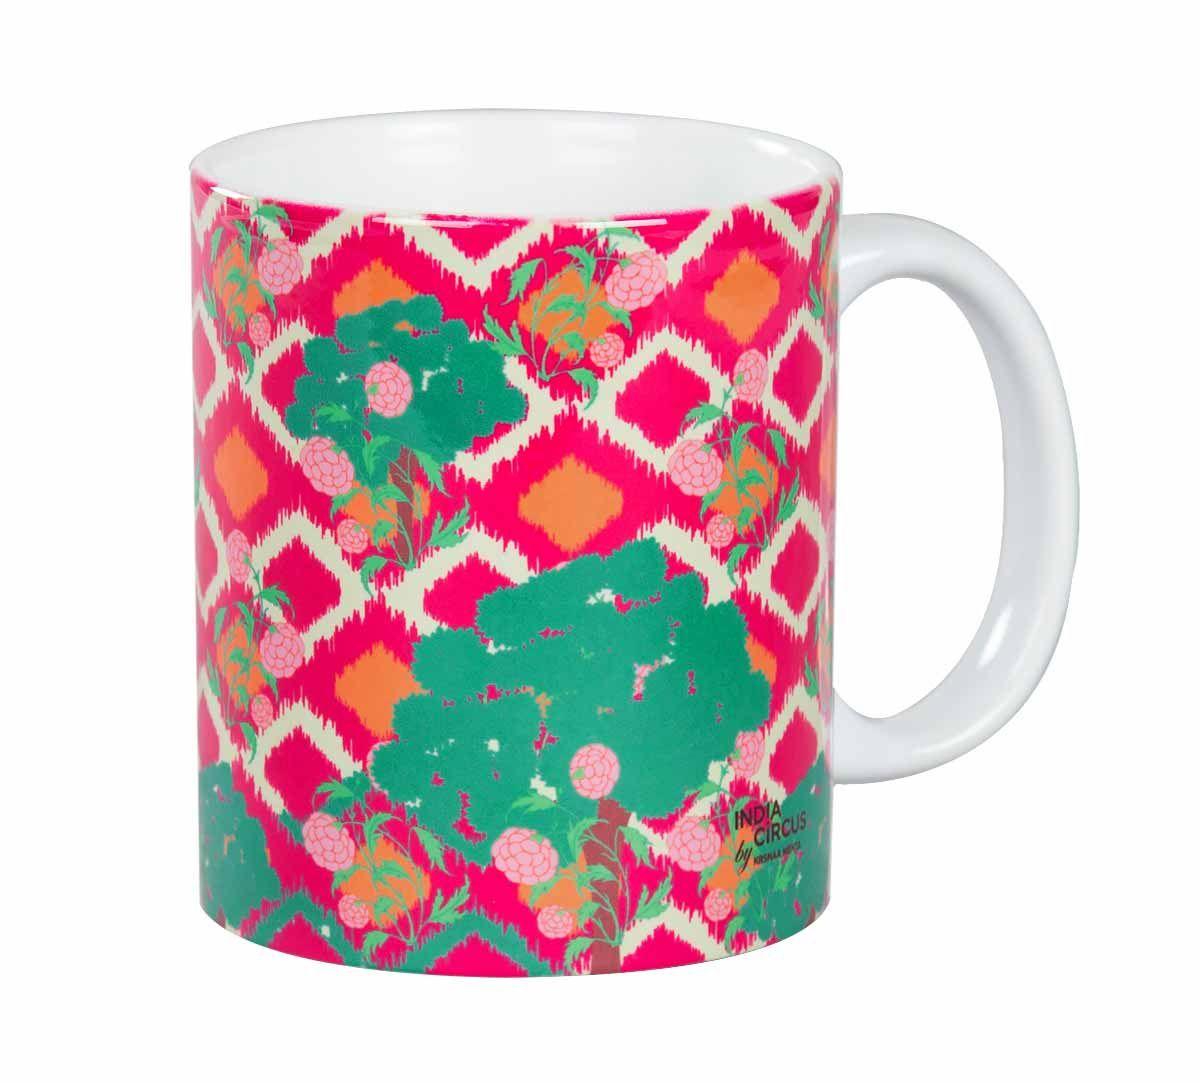 Lattice Vermillion Mug